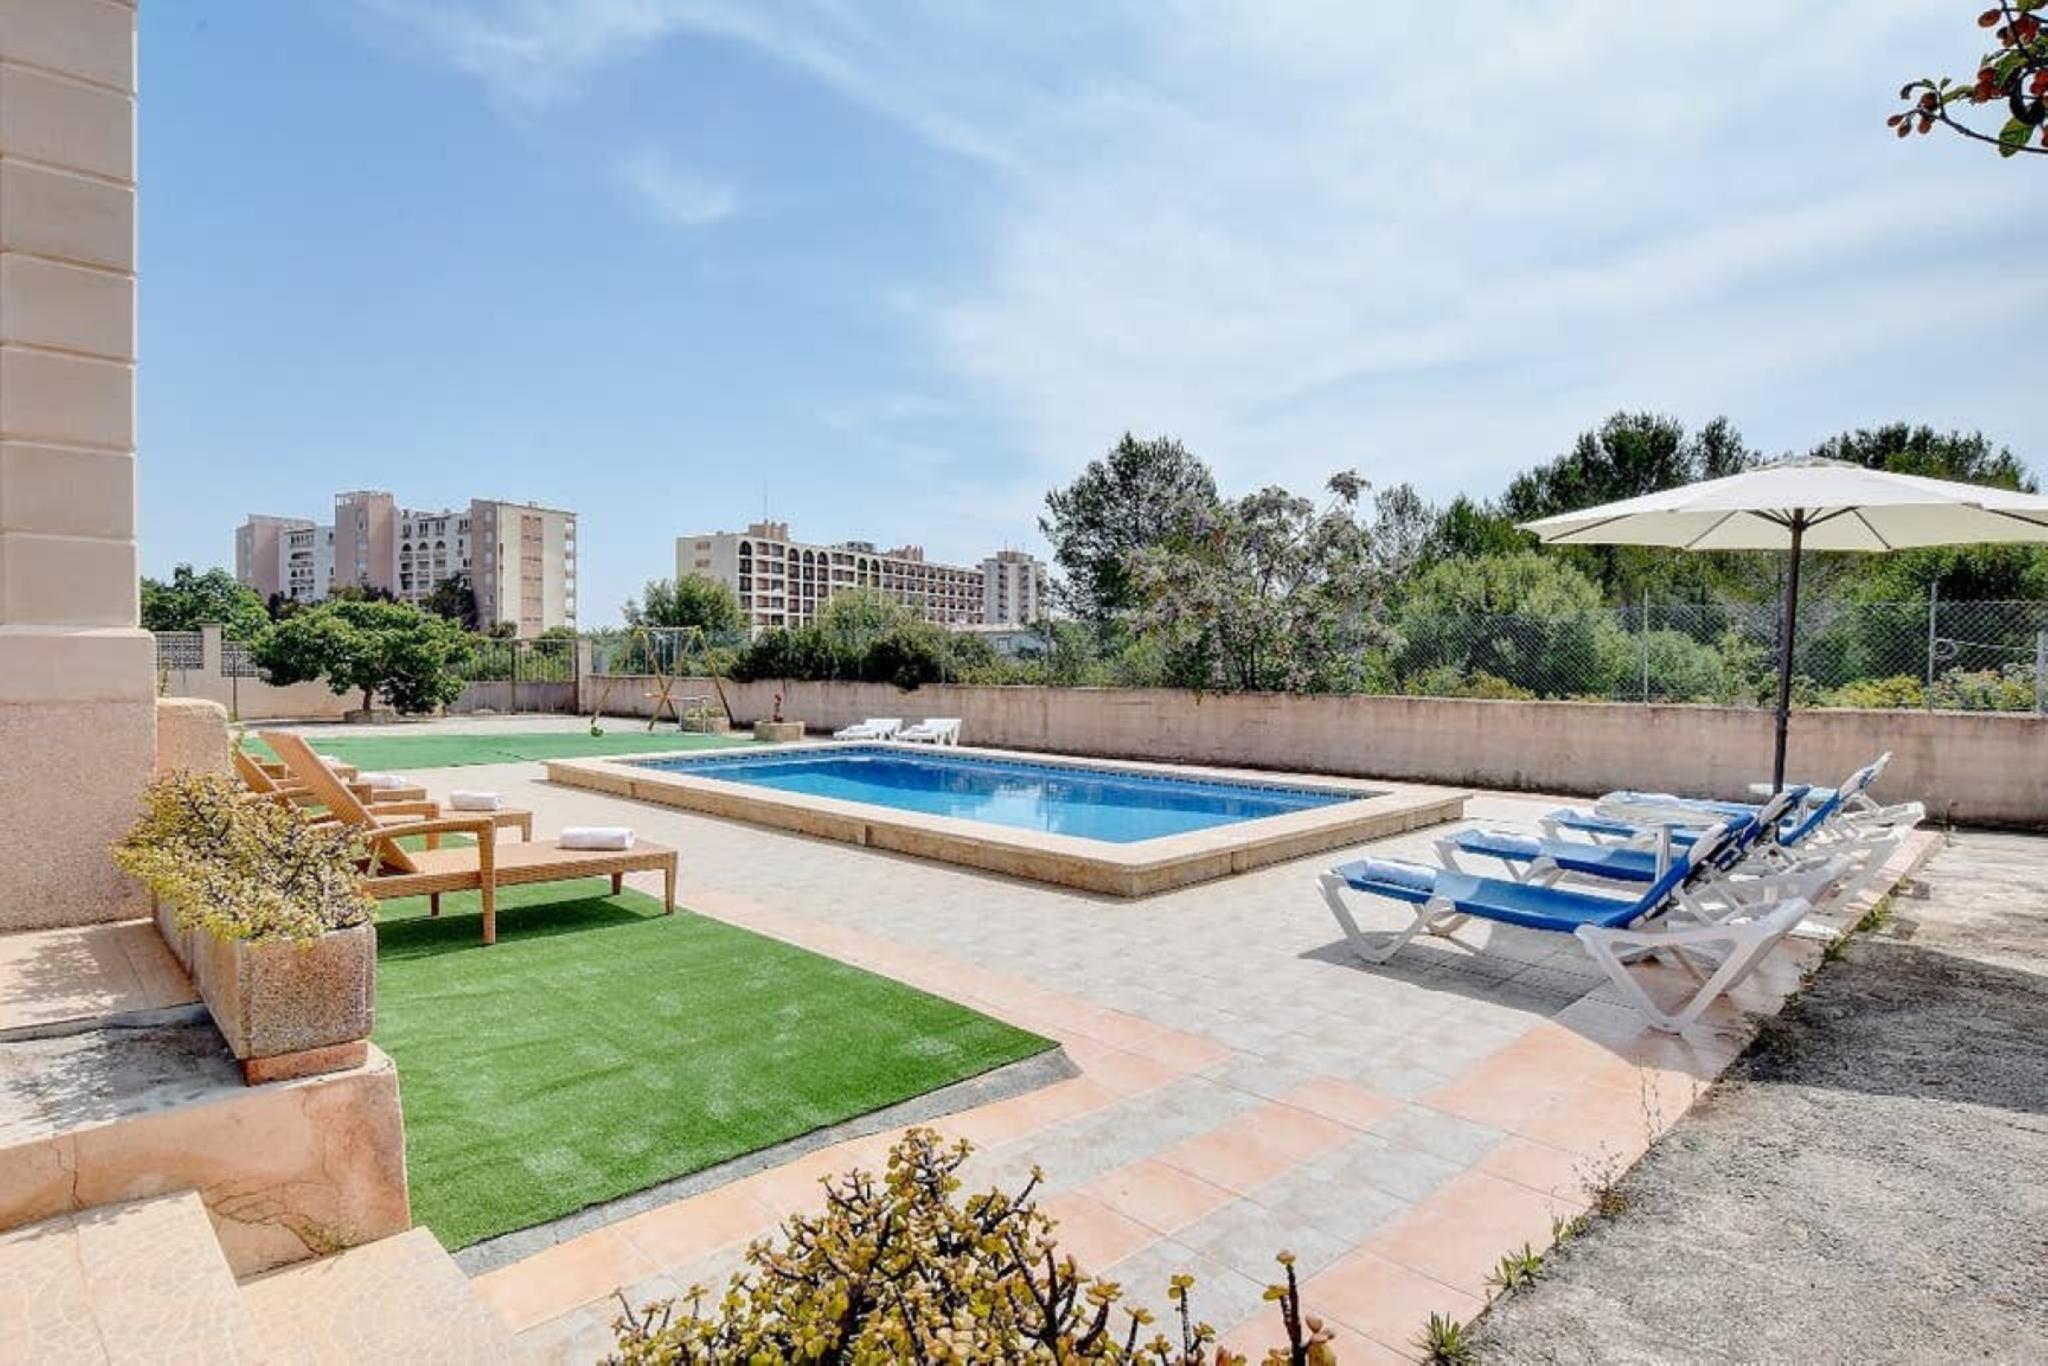 107783 - Villa in Cales de Mallorca